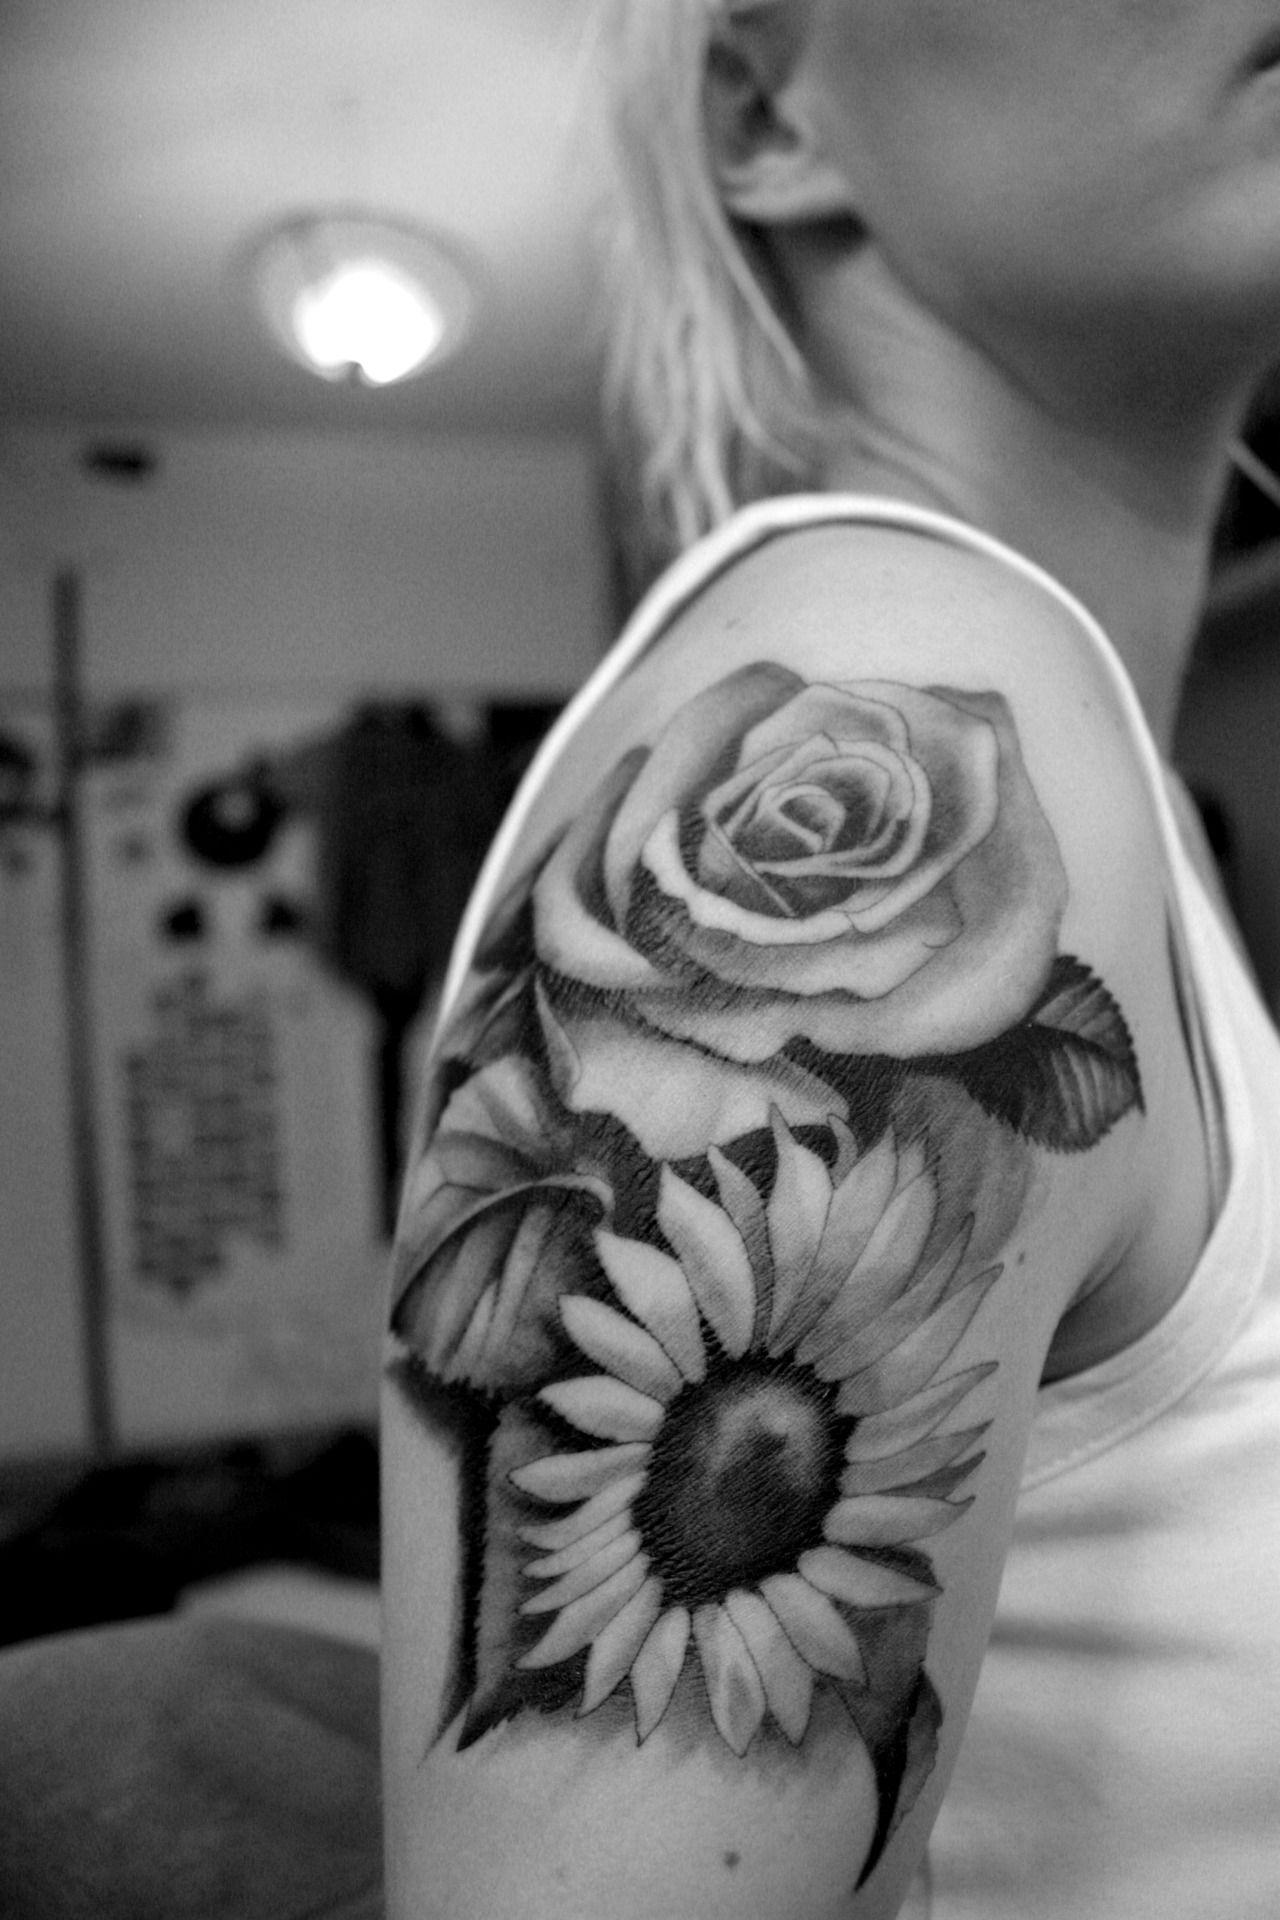 Sunflower Tattoo Tumblr : sunflower, tattoo, tumblr, Sunflower, Tattoo, Tumblr, Shoulder,, Tattoos,, Sleeve